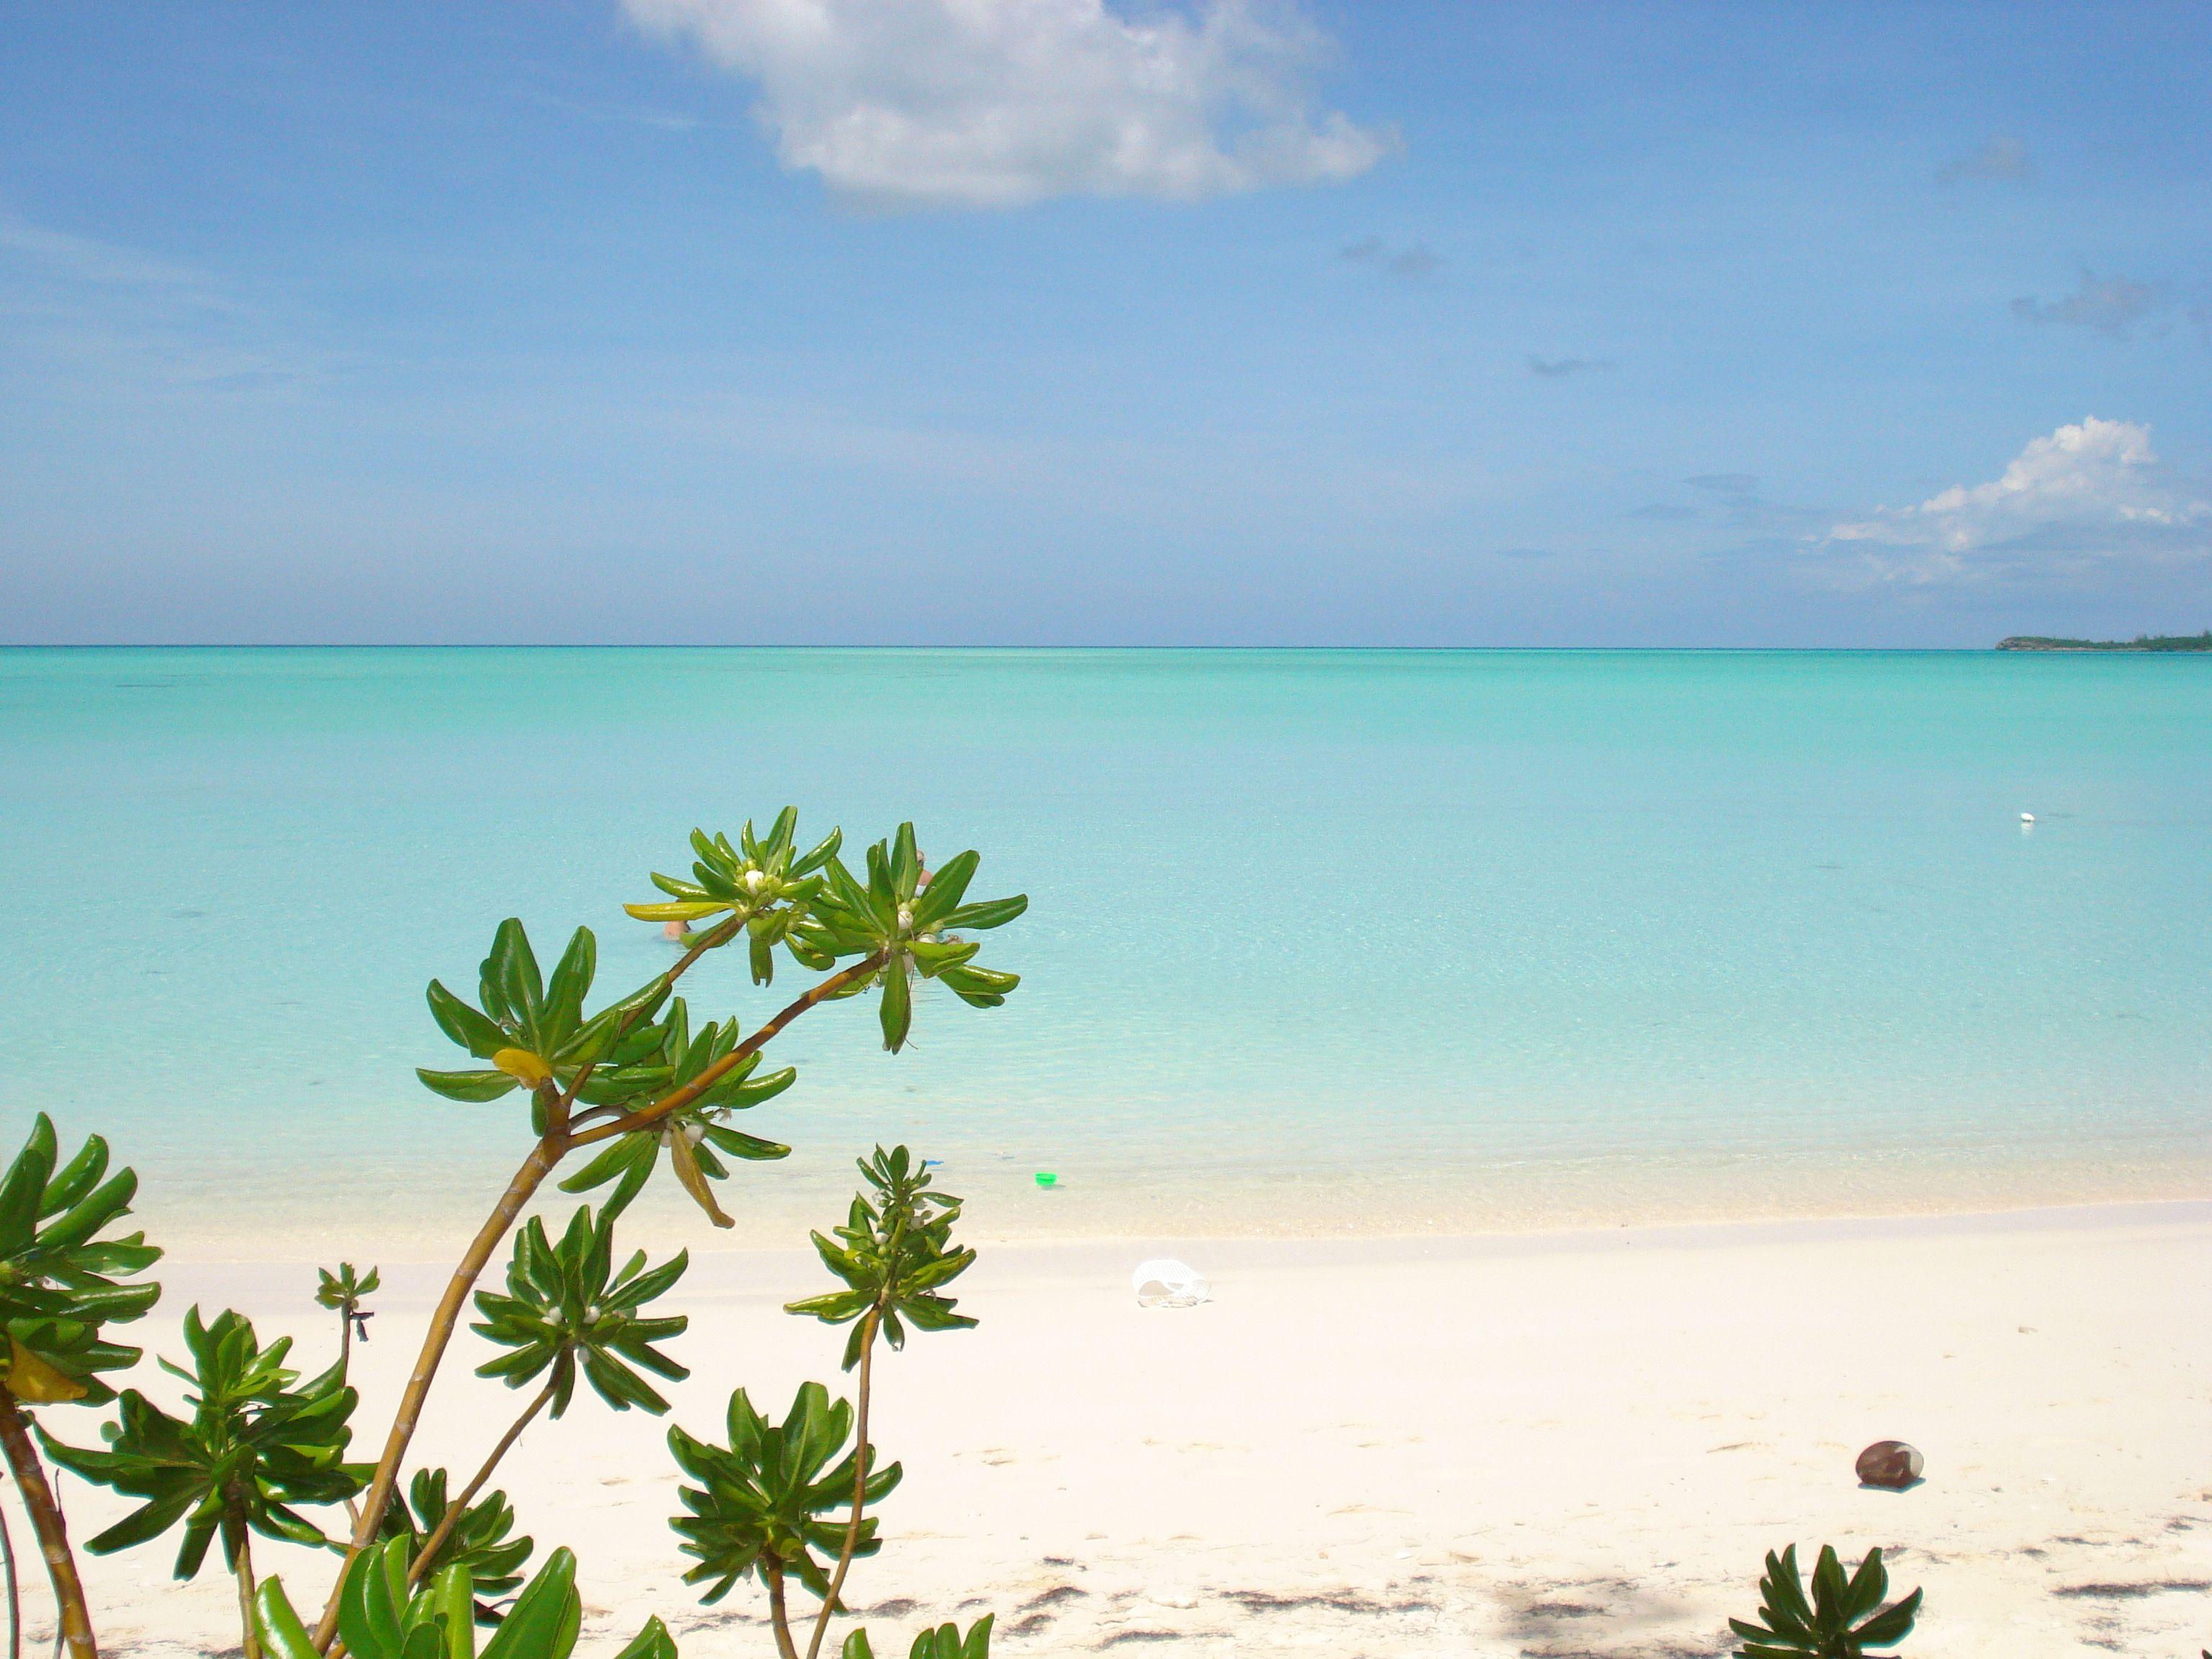 spanish wells, bahamas | favorite places | places, bahamas